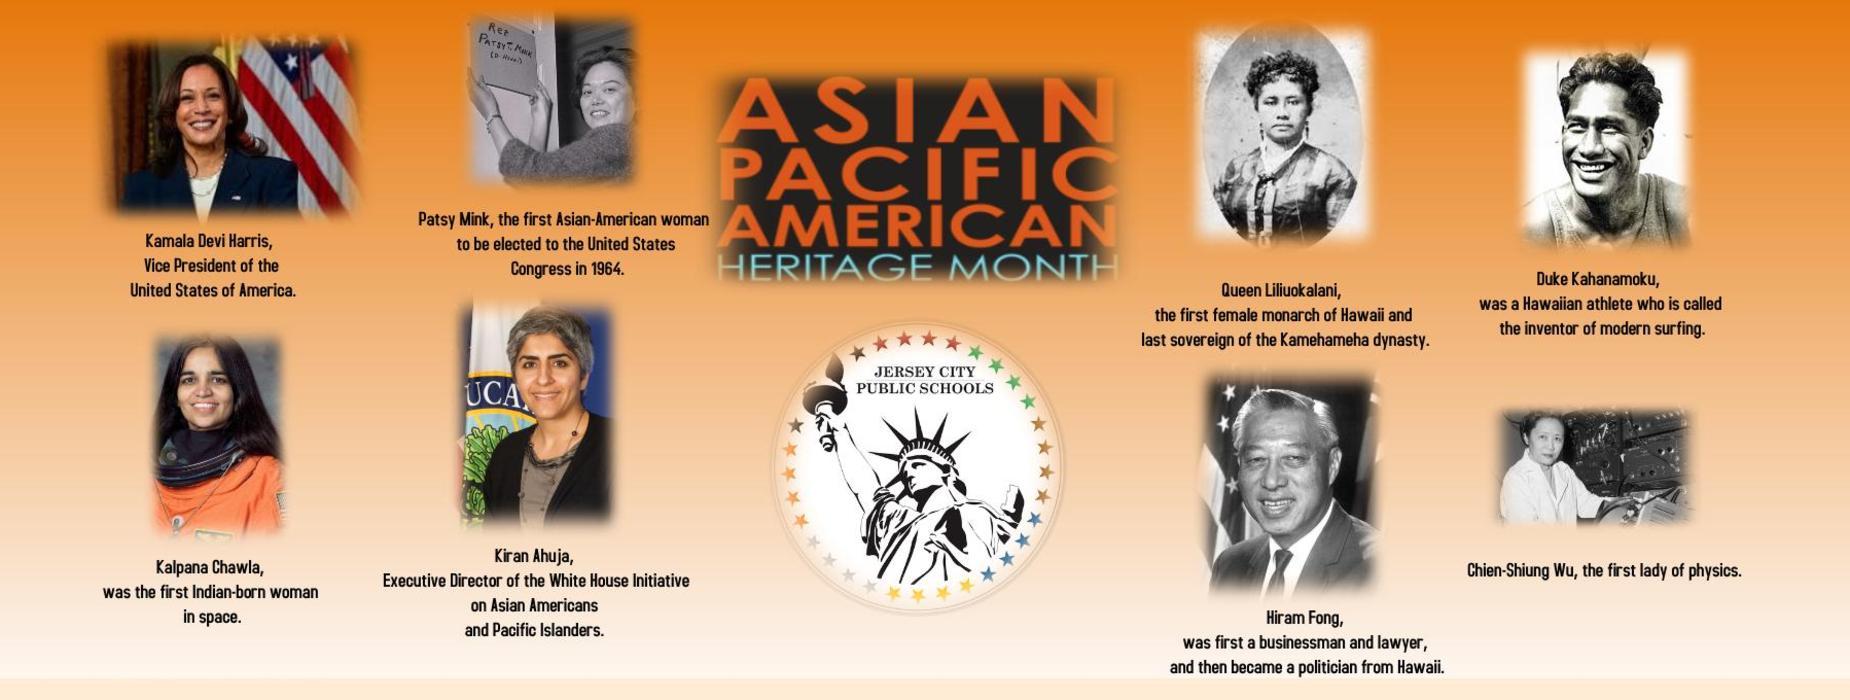 asian pacific islander